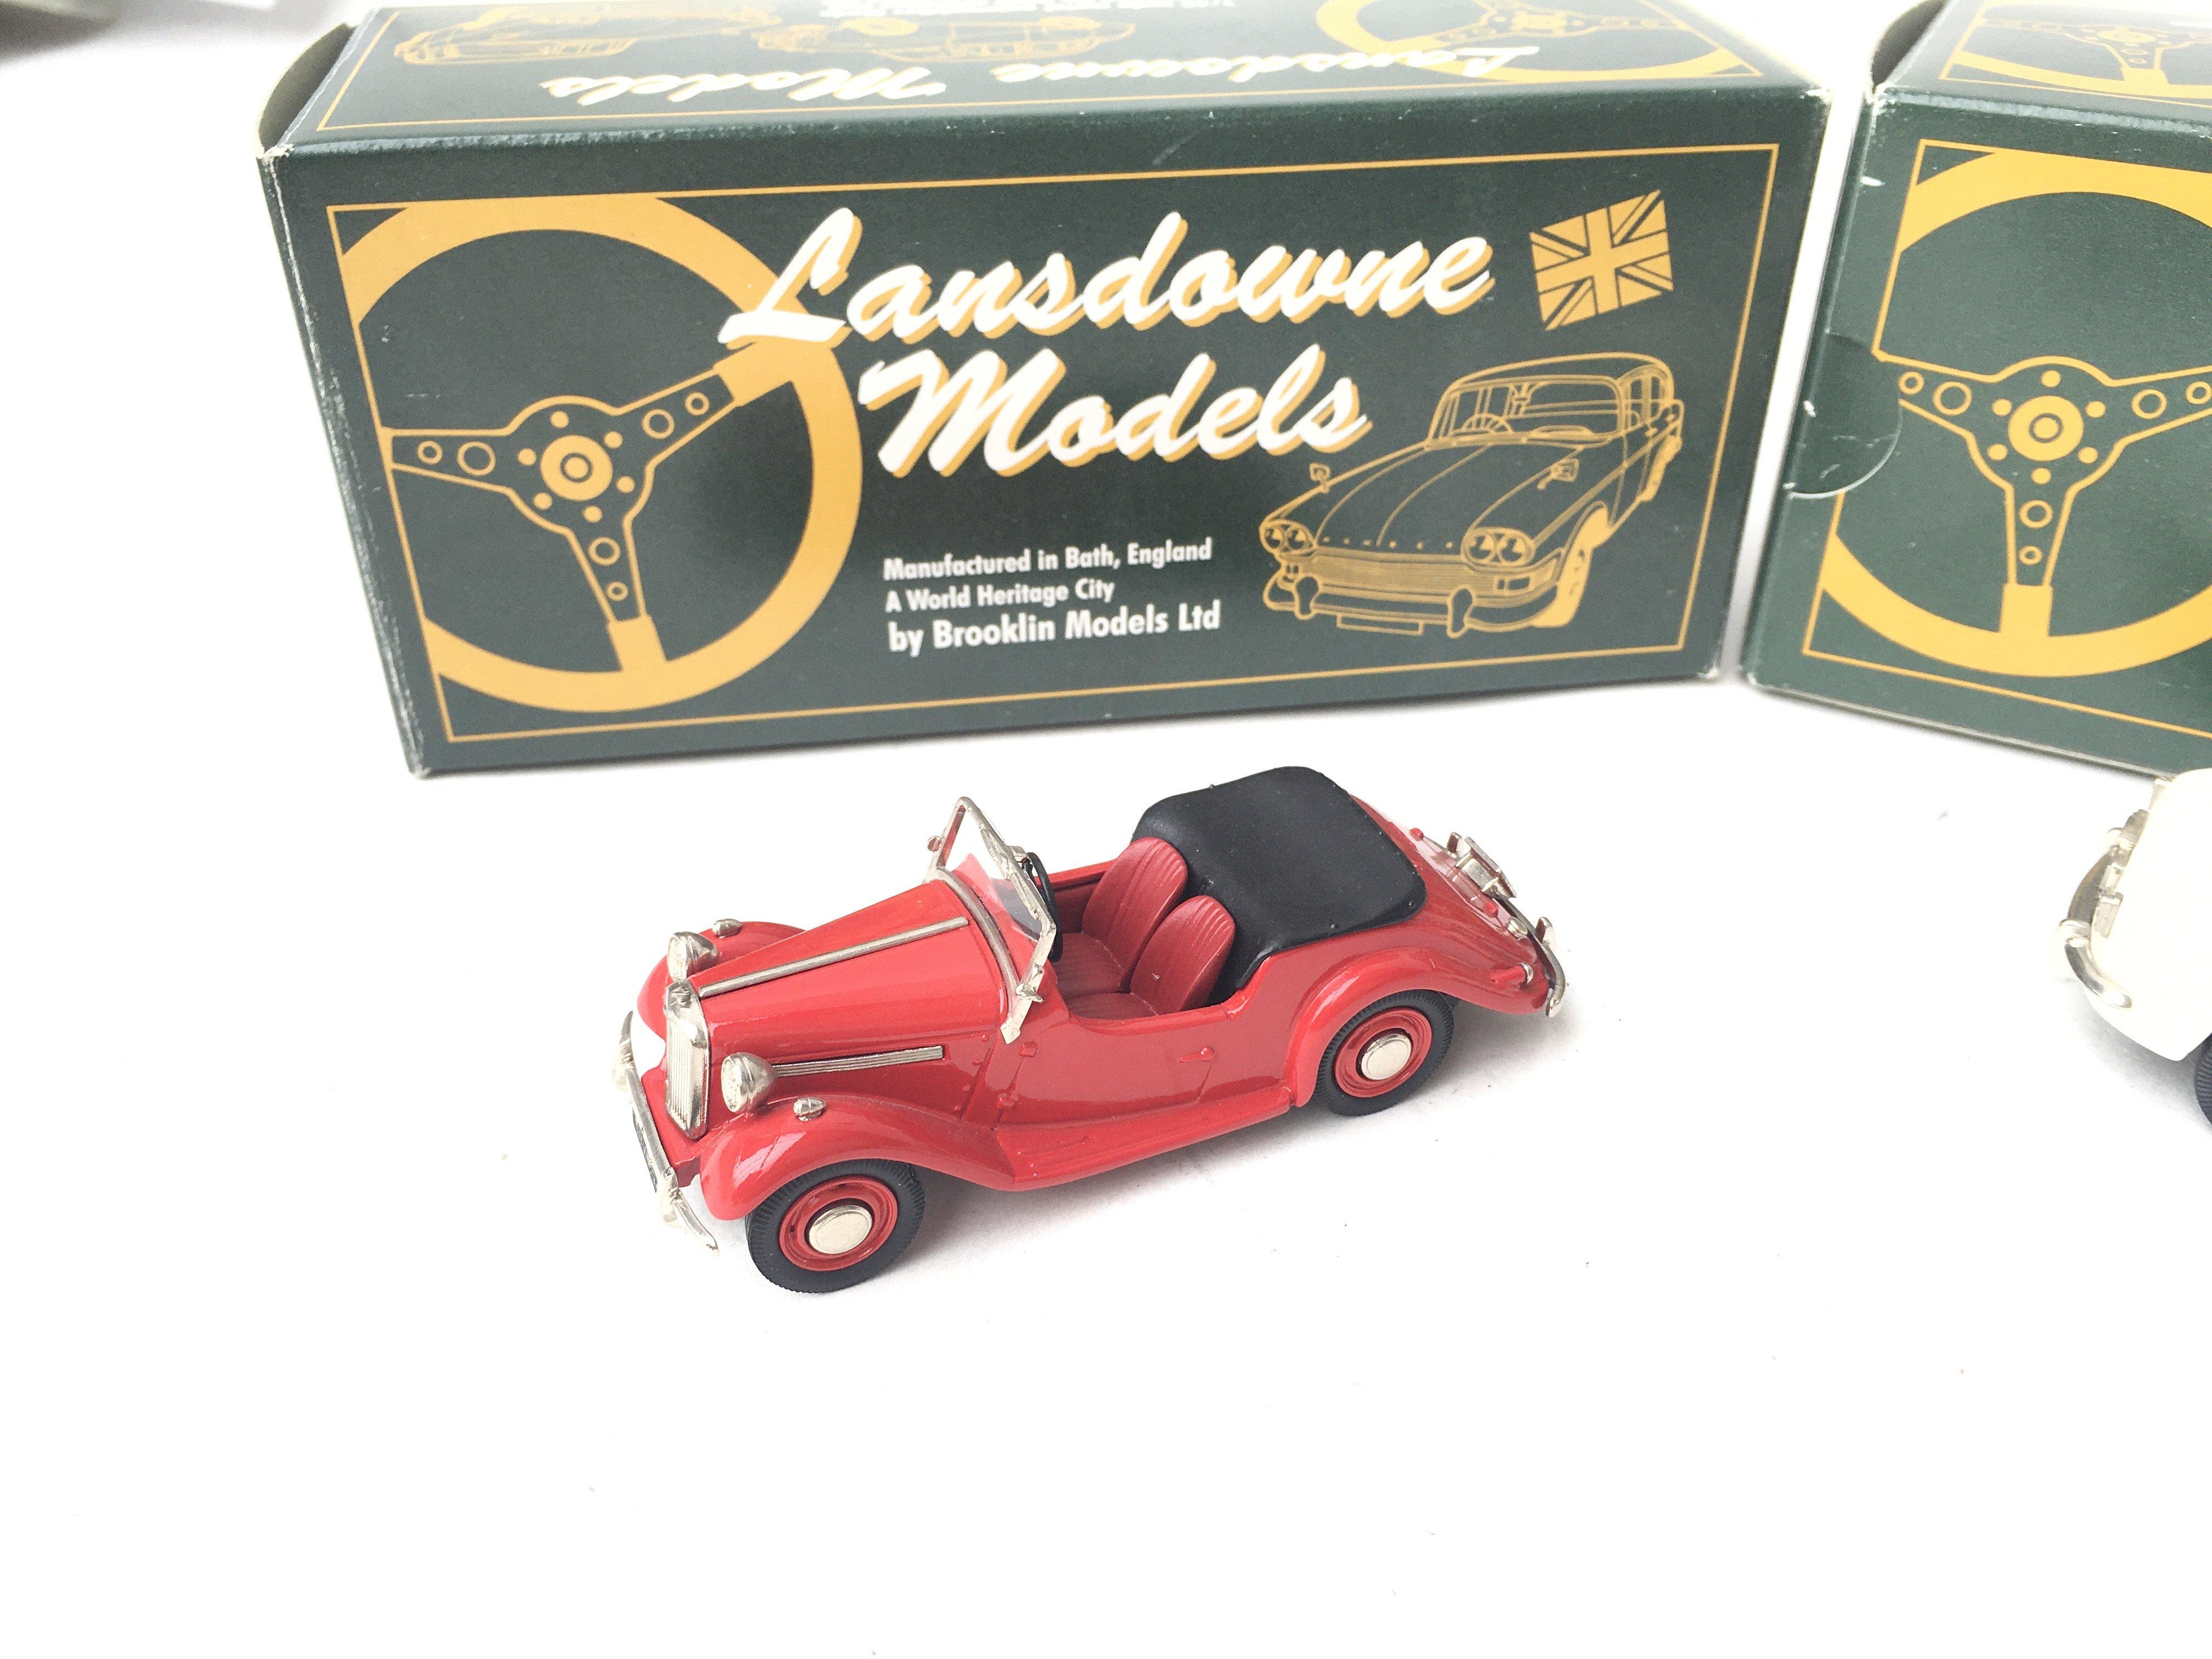 2 X Lansdowne Models. LDM 25 1954 Singer SM Roadst - Image 2 of 3